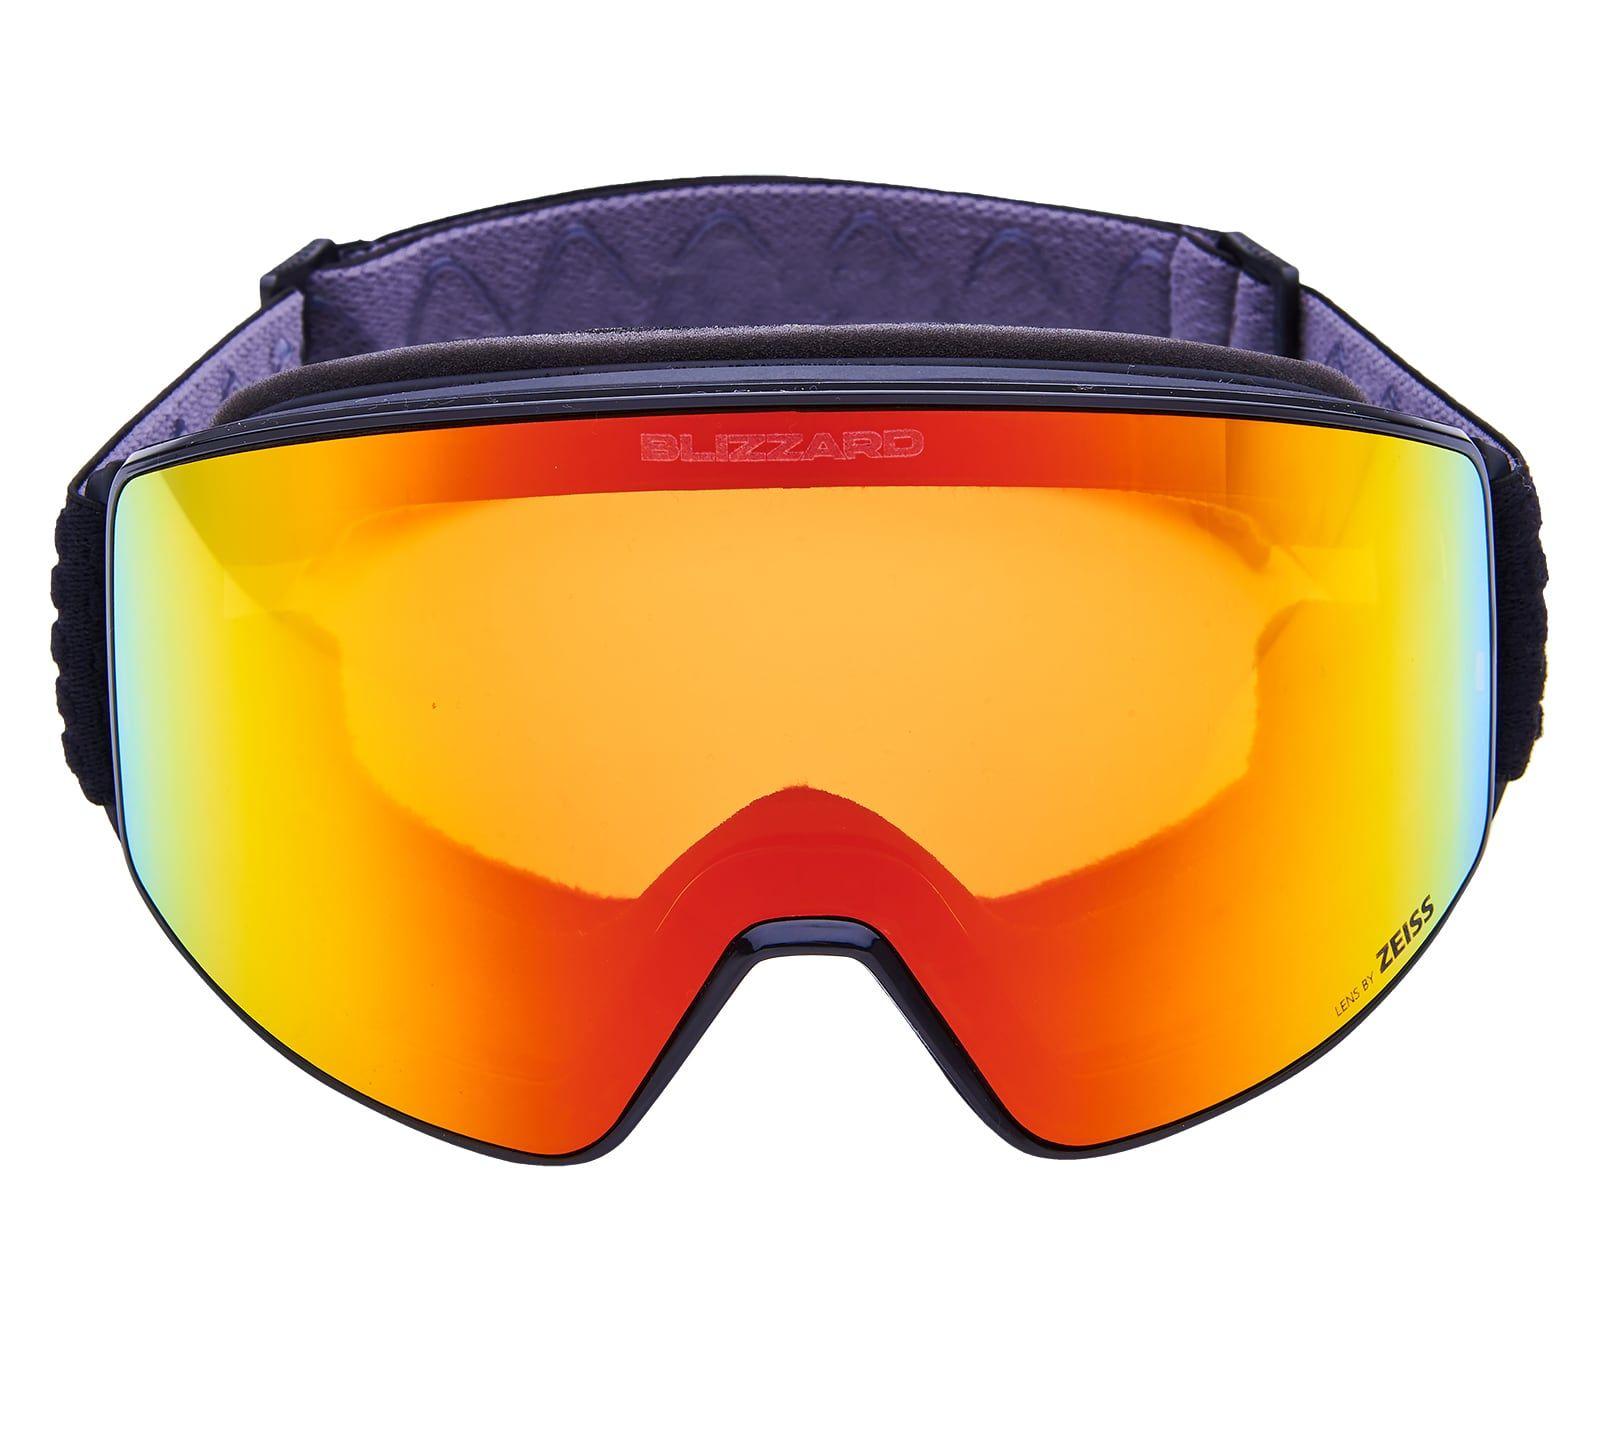 BLIZ Ski Gog. 931 MDAZWO, black matt, orange2, red REVO SONAR